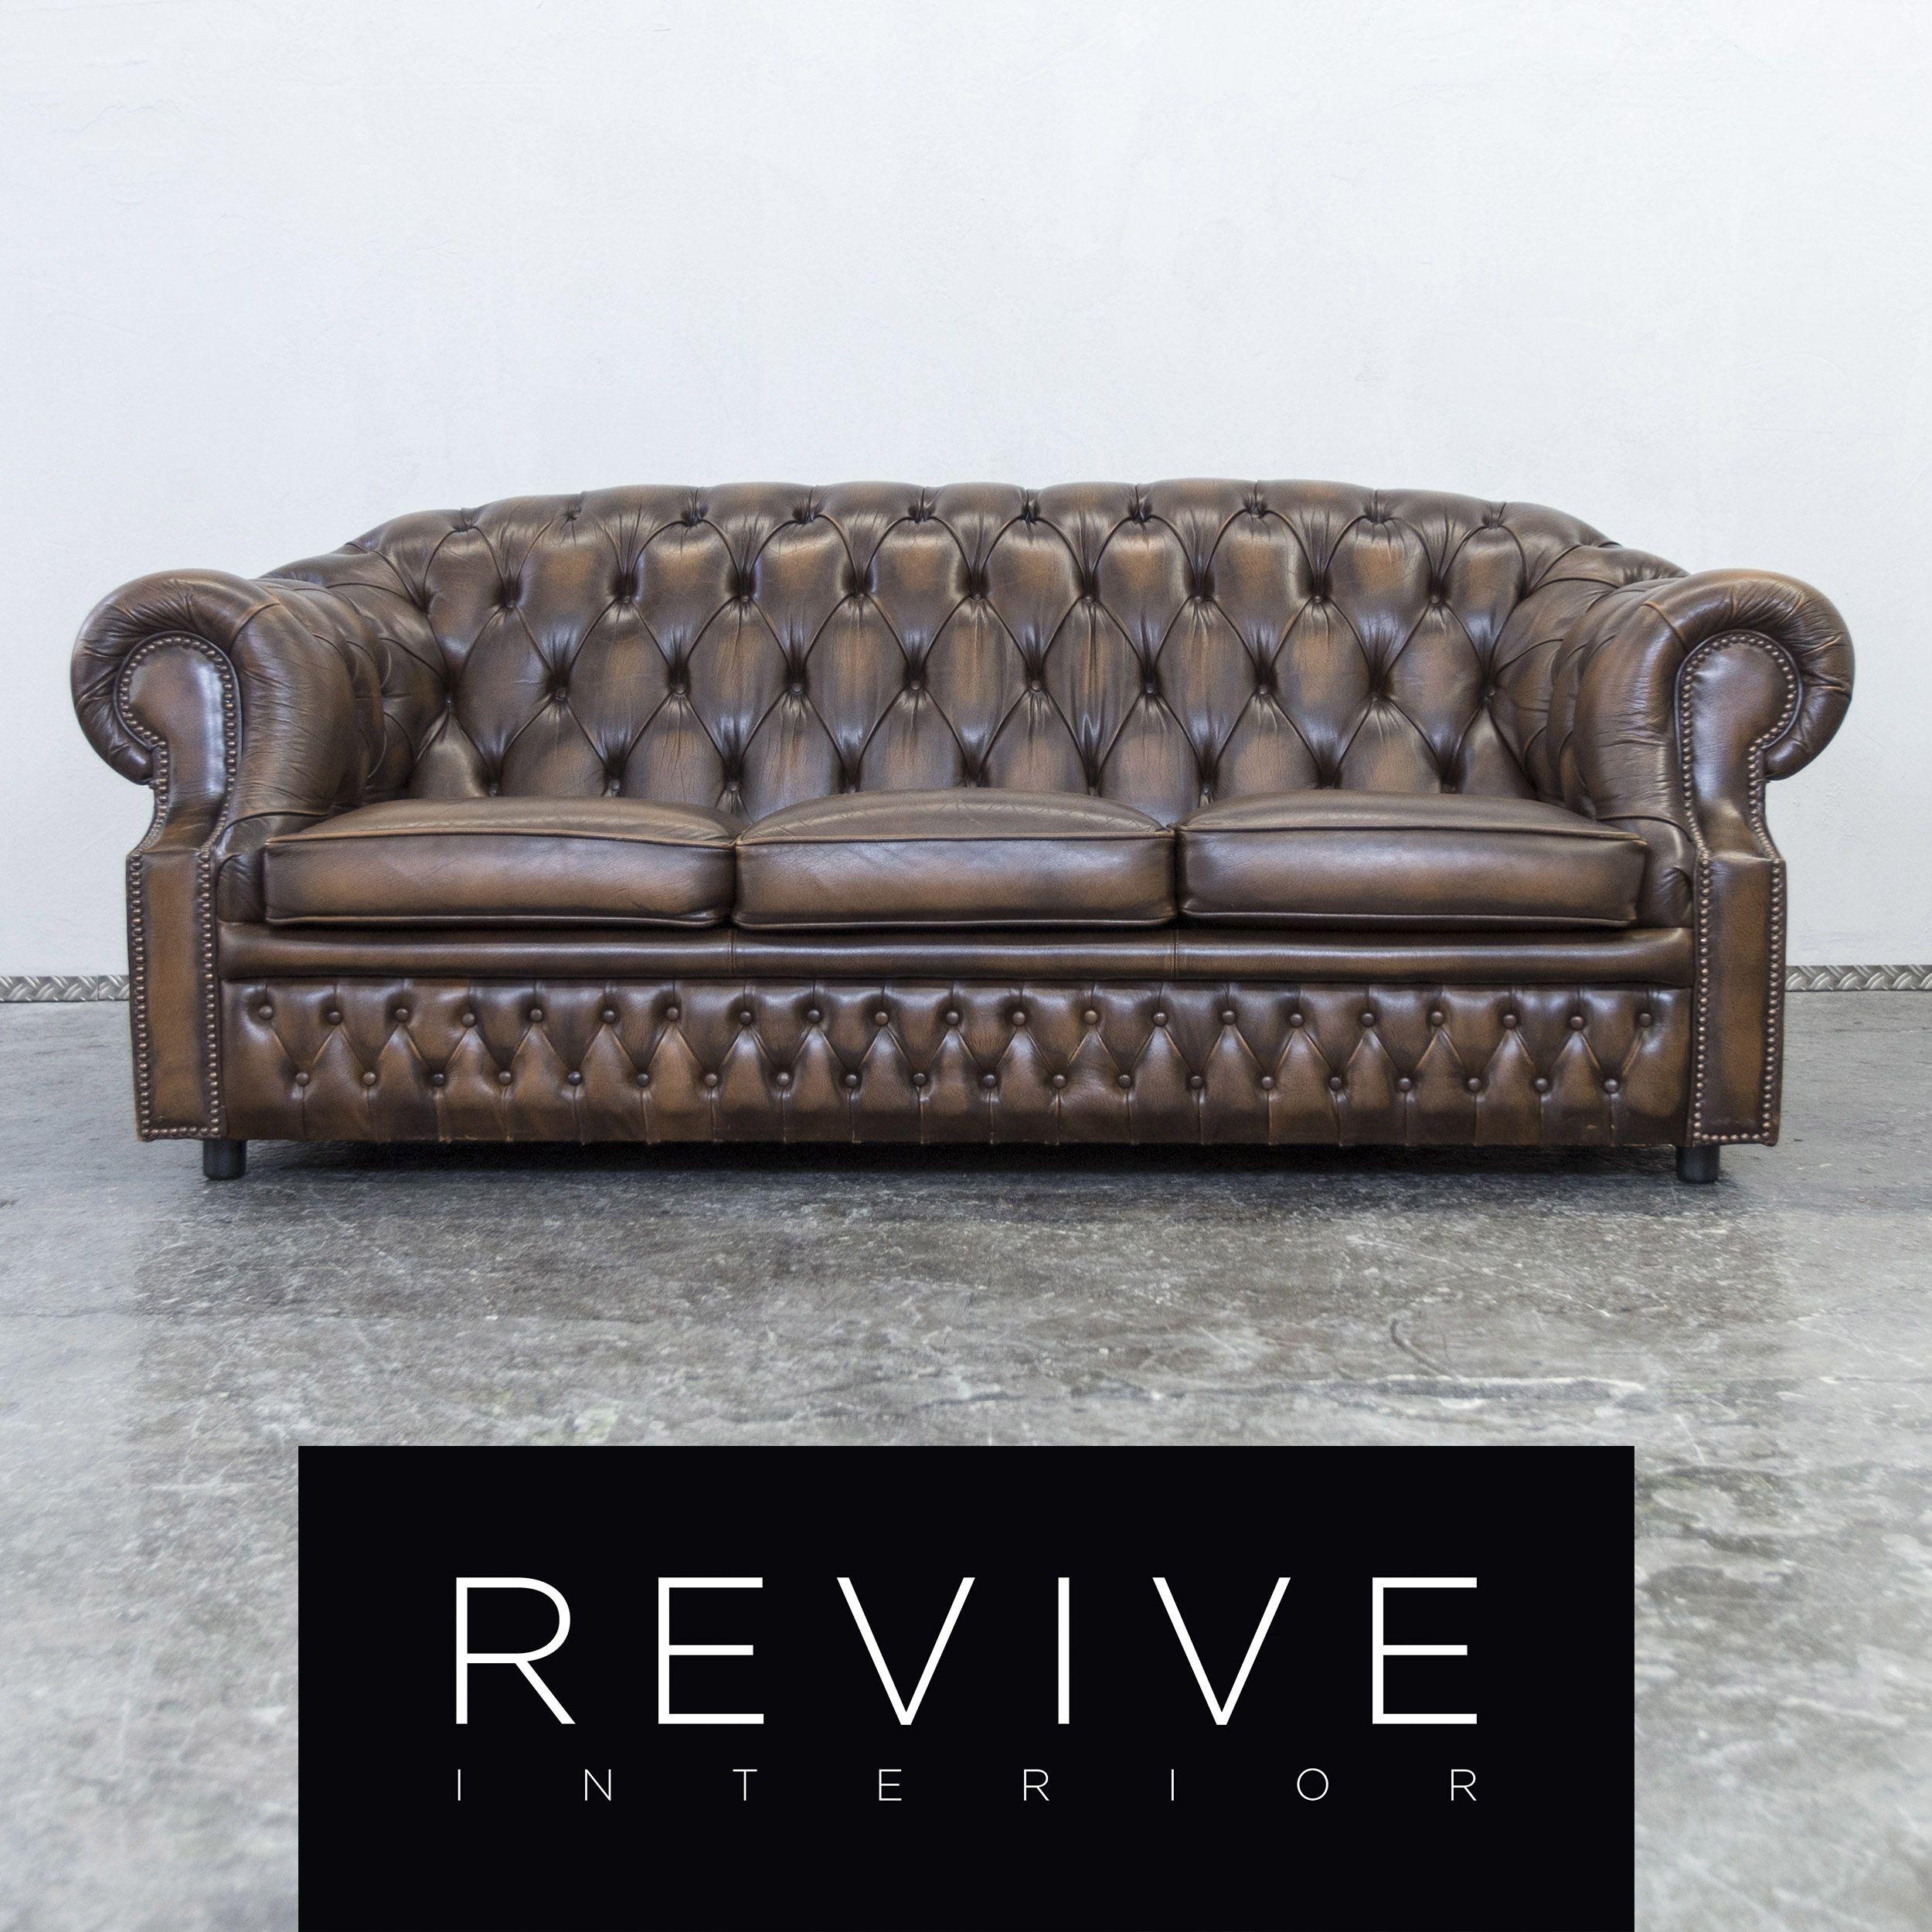 Centurion Chesterfield Leder Sofa Dreisitzer Couch Vintage Retro